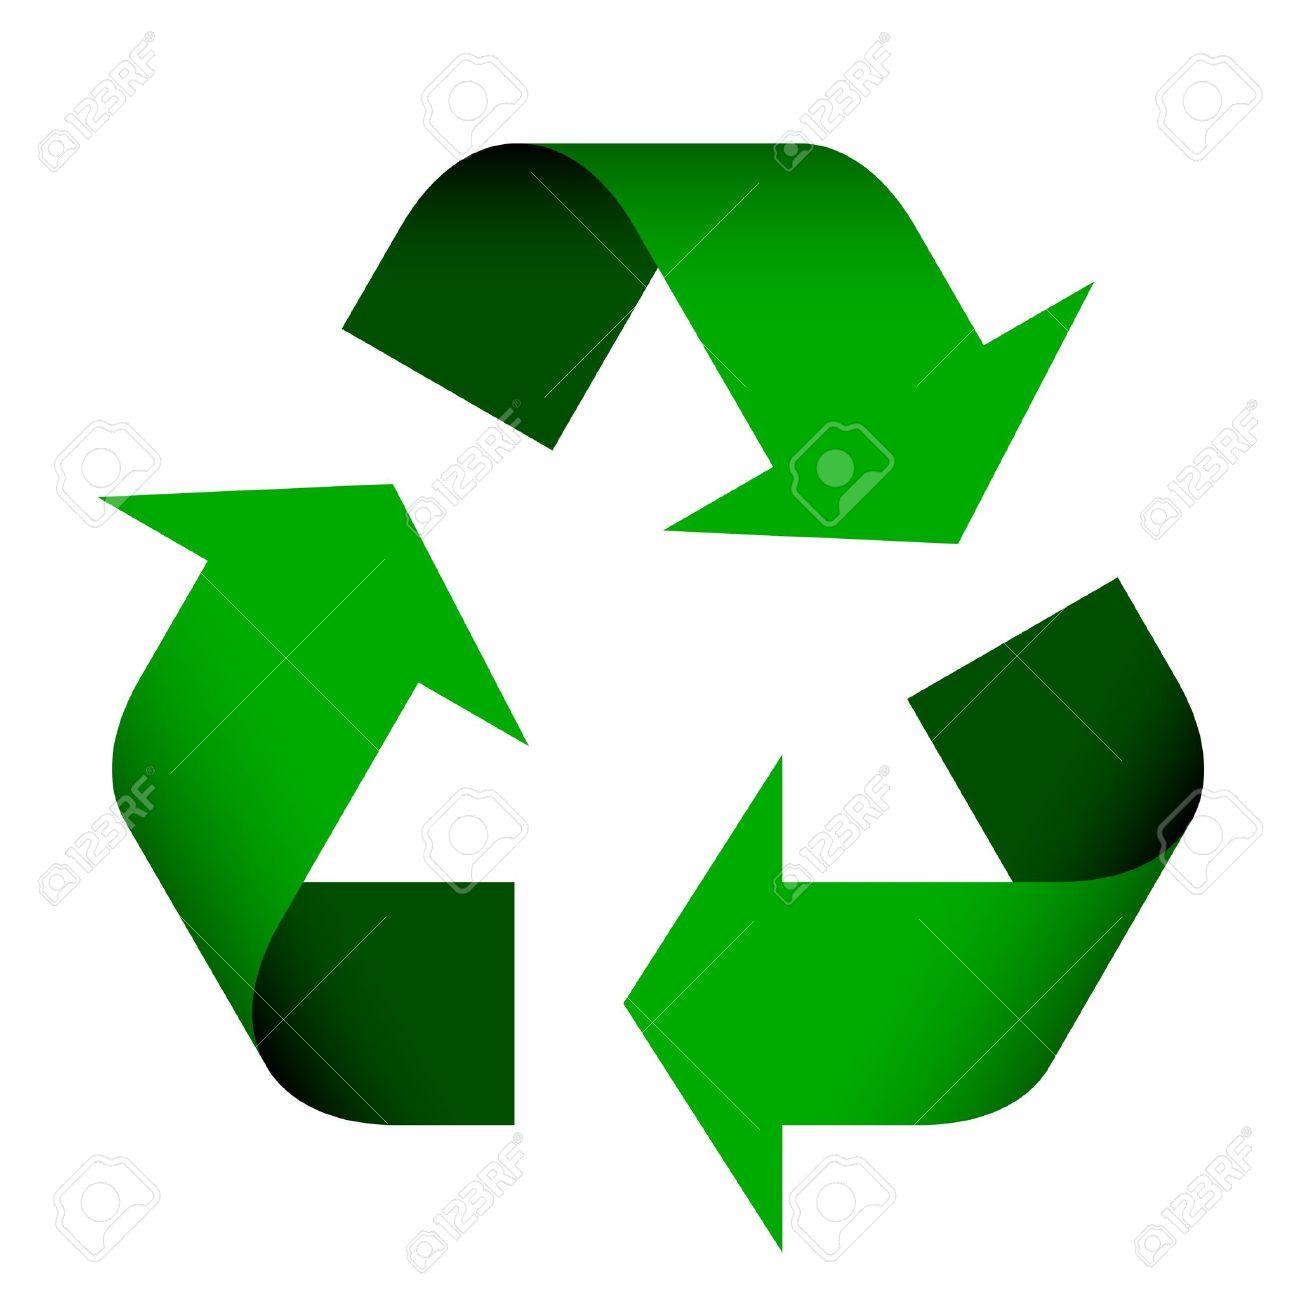 Vector recycle symbol royalty free cliparts vectors and stock vector recycle symbol stock vector 11519775 biocorpaavc